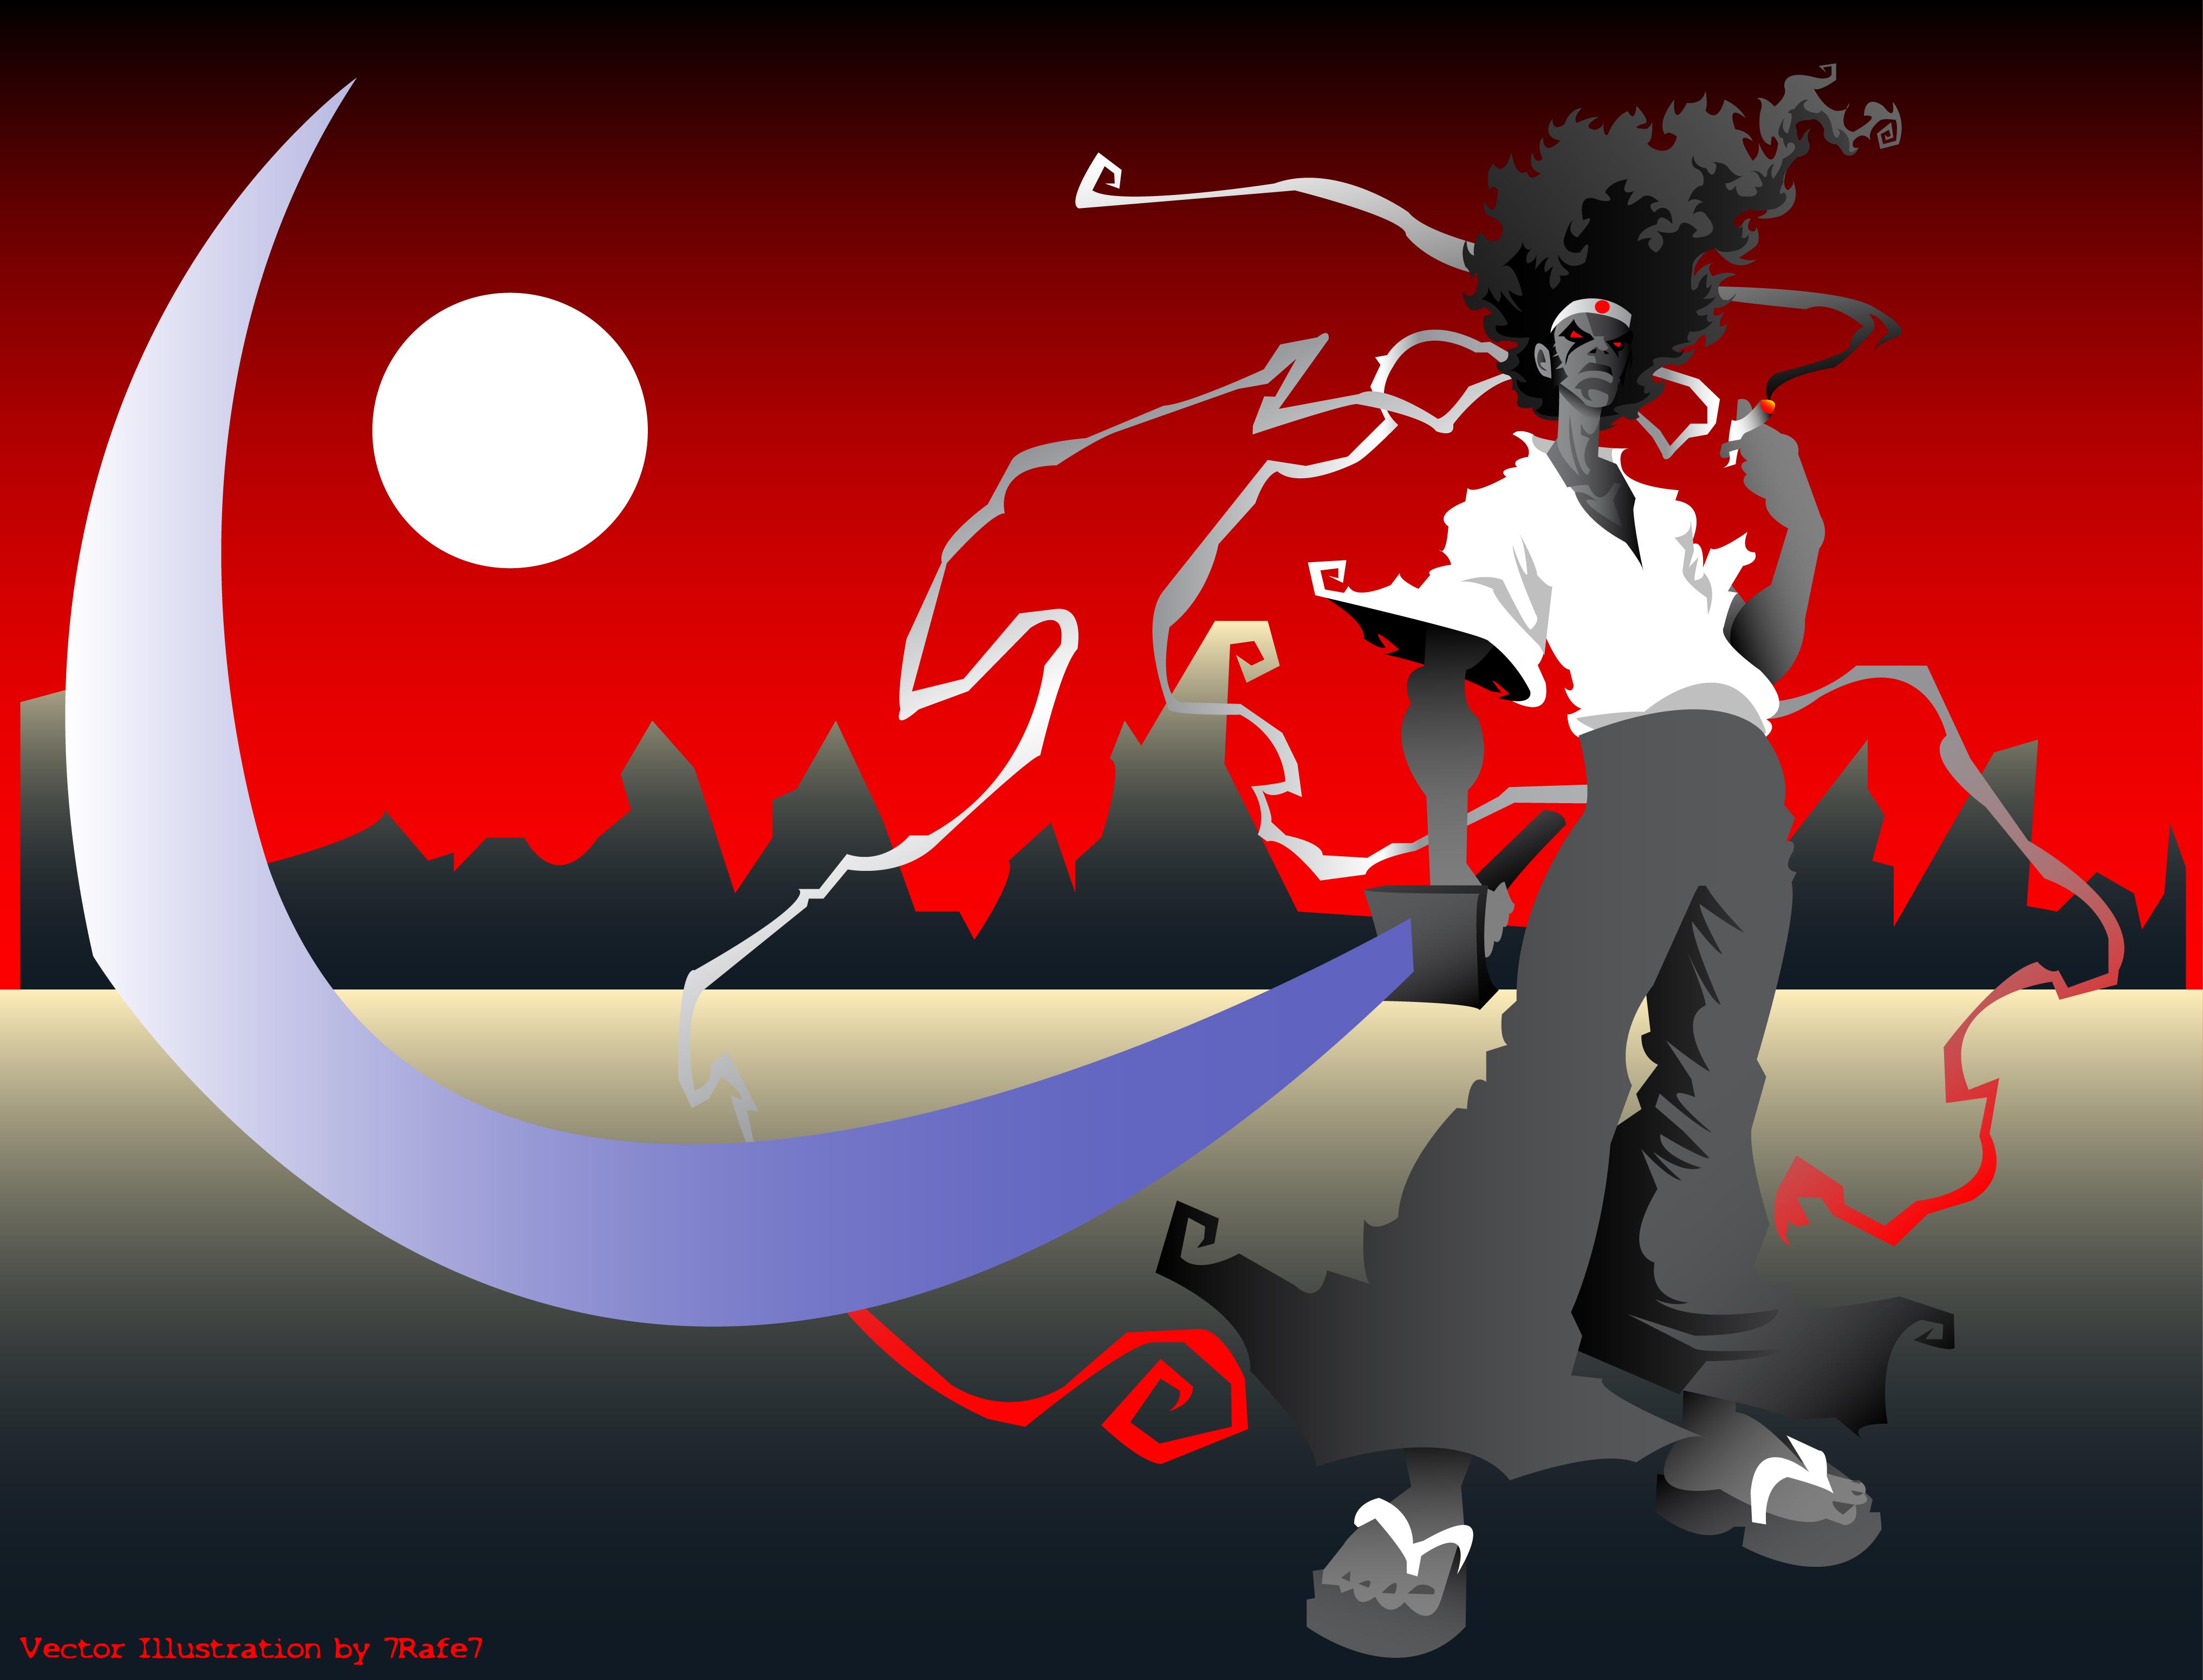 Afro Samurai Vector by 7rafe7 on DeviantArt